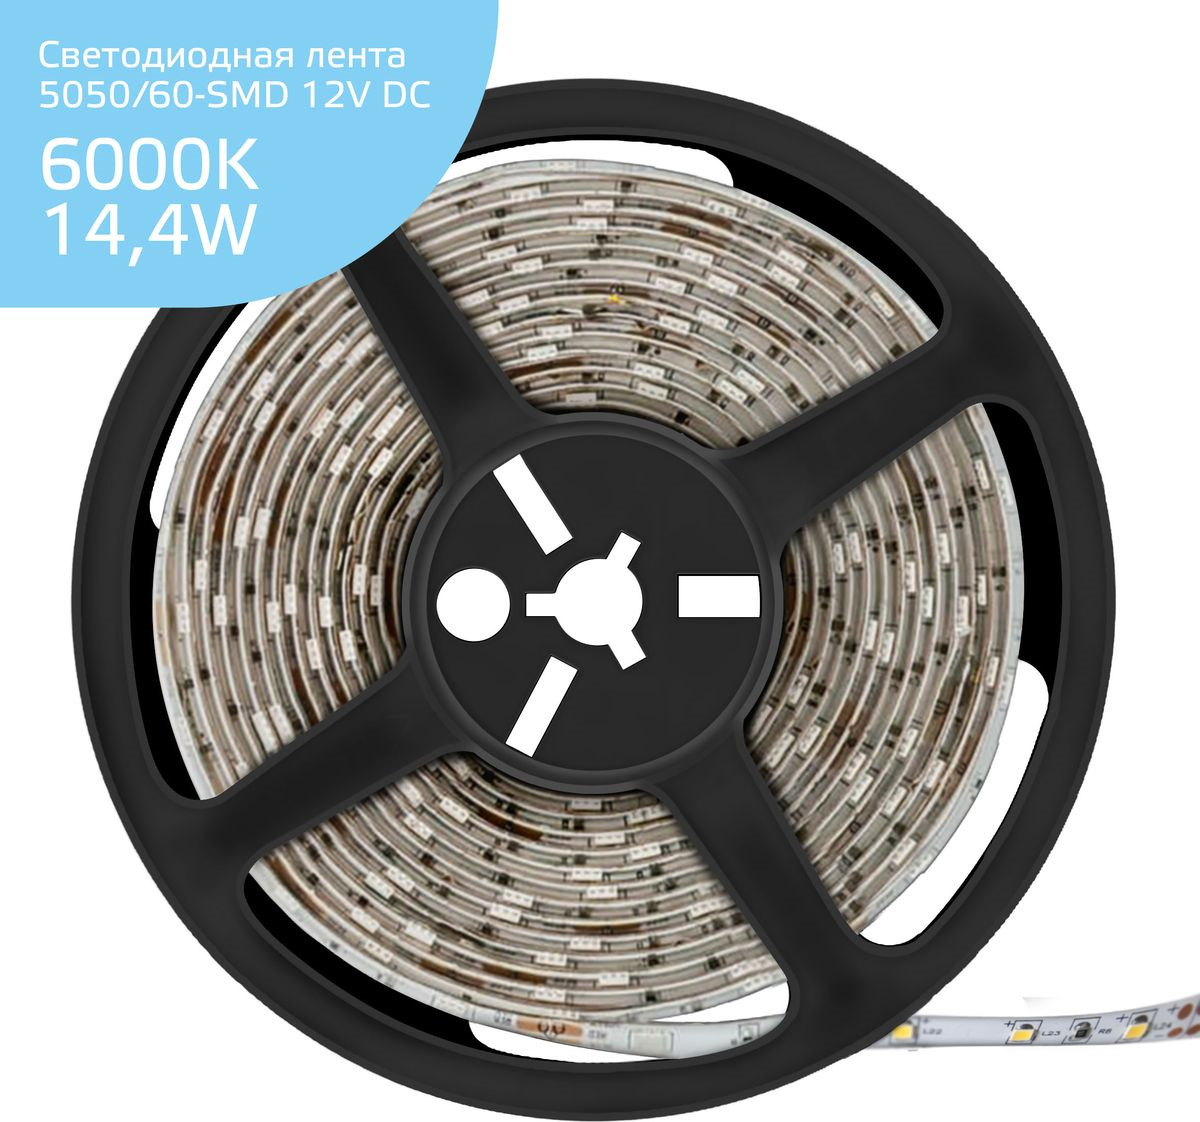 Светодиодная лента Gauss LED, 5050/60-SMD, 14.4W, 12V, DC, холодный белый, 5 м, 14,4 Вт светодиодная лента gauss elementary 5050 60 smd 14 4w 12v ip66 5м 6000k